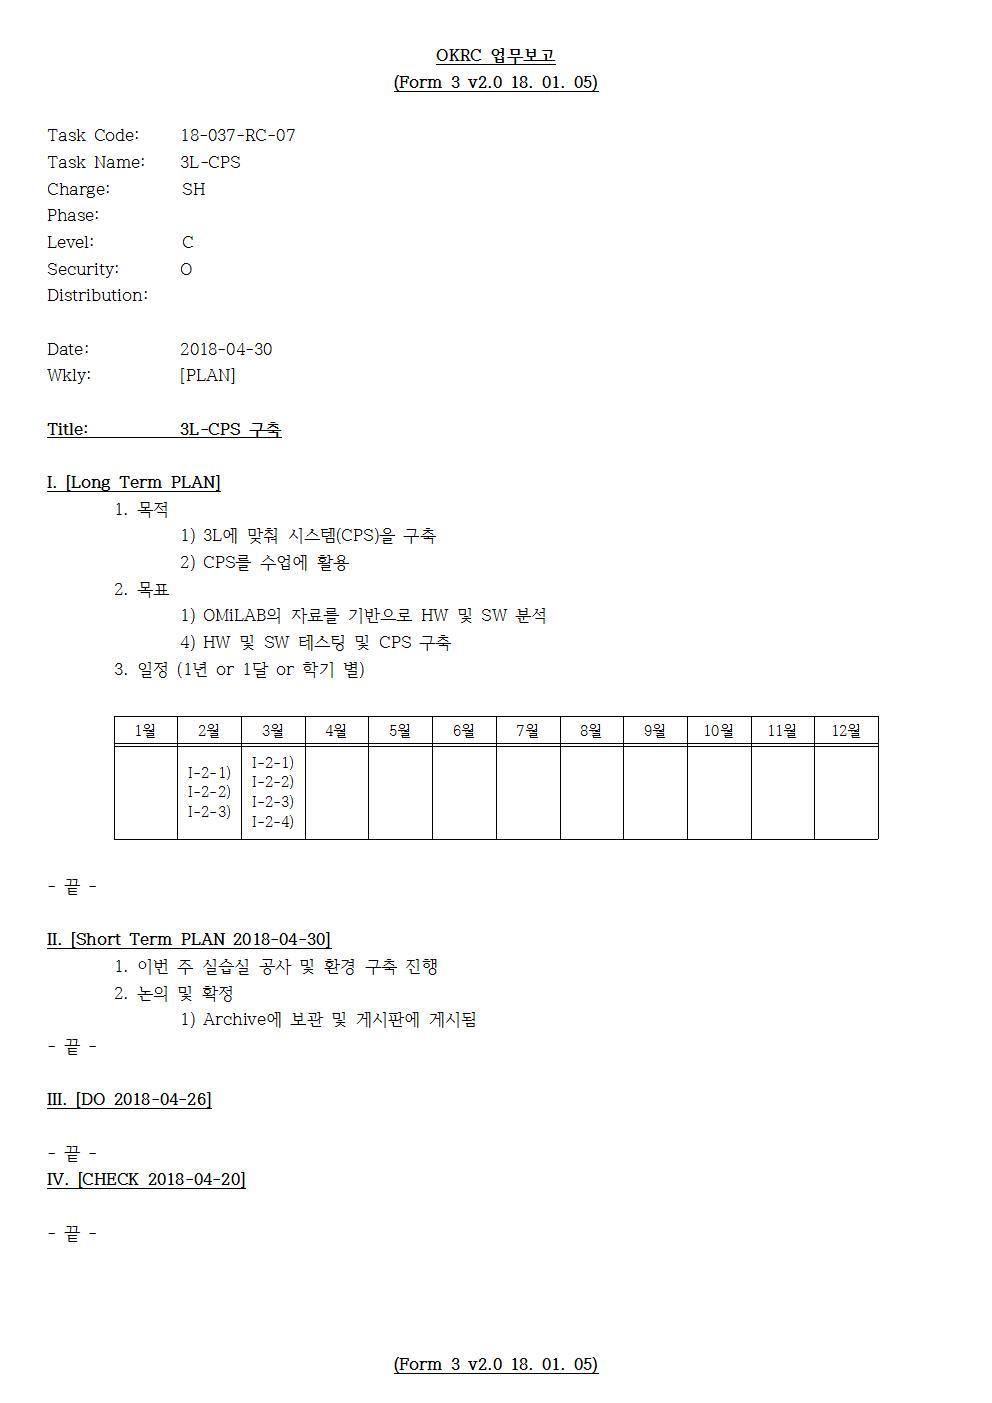 D-[18-037-RC-07]-[3L-CPS]-[2018-04-30][SH]001.jpg